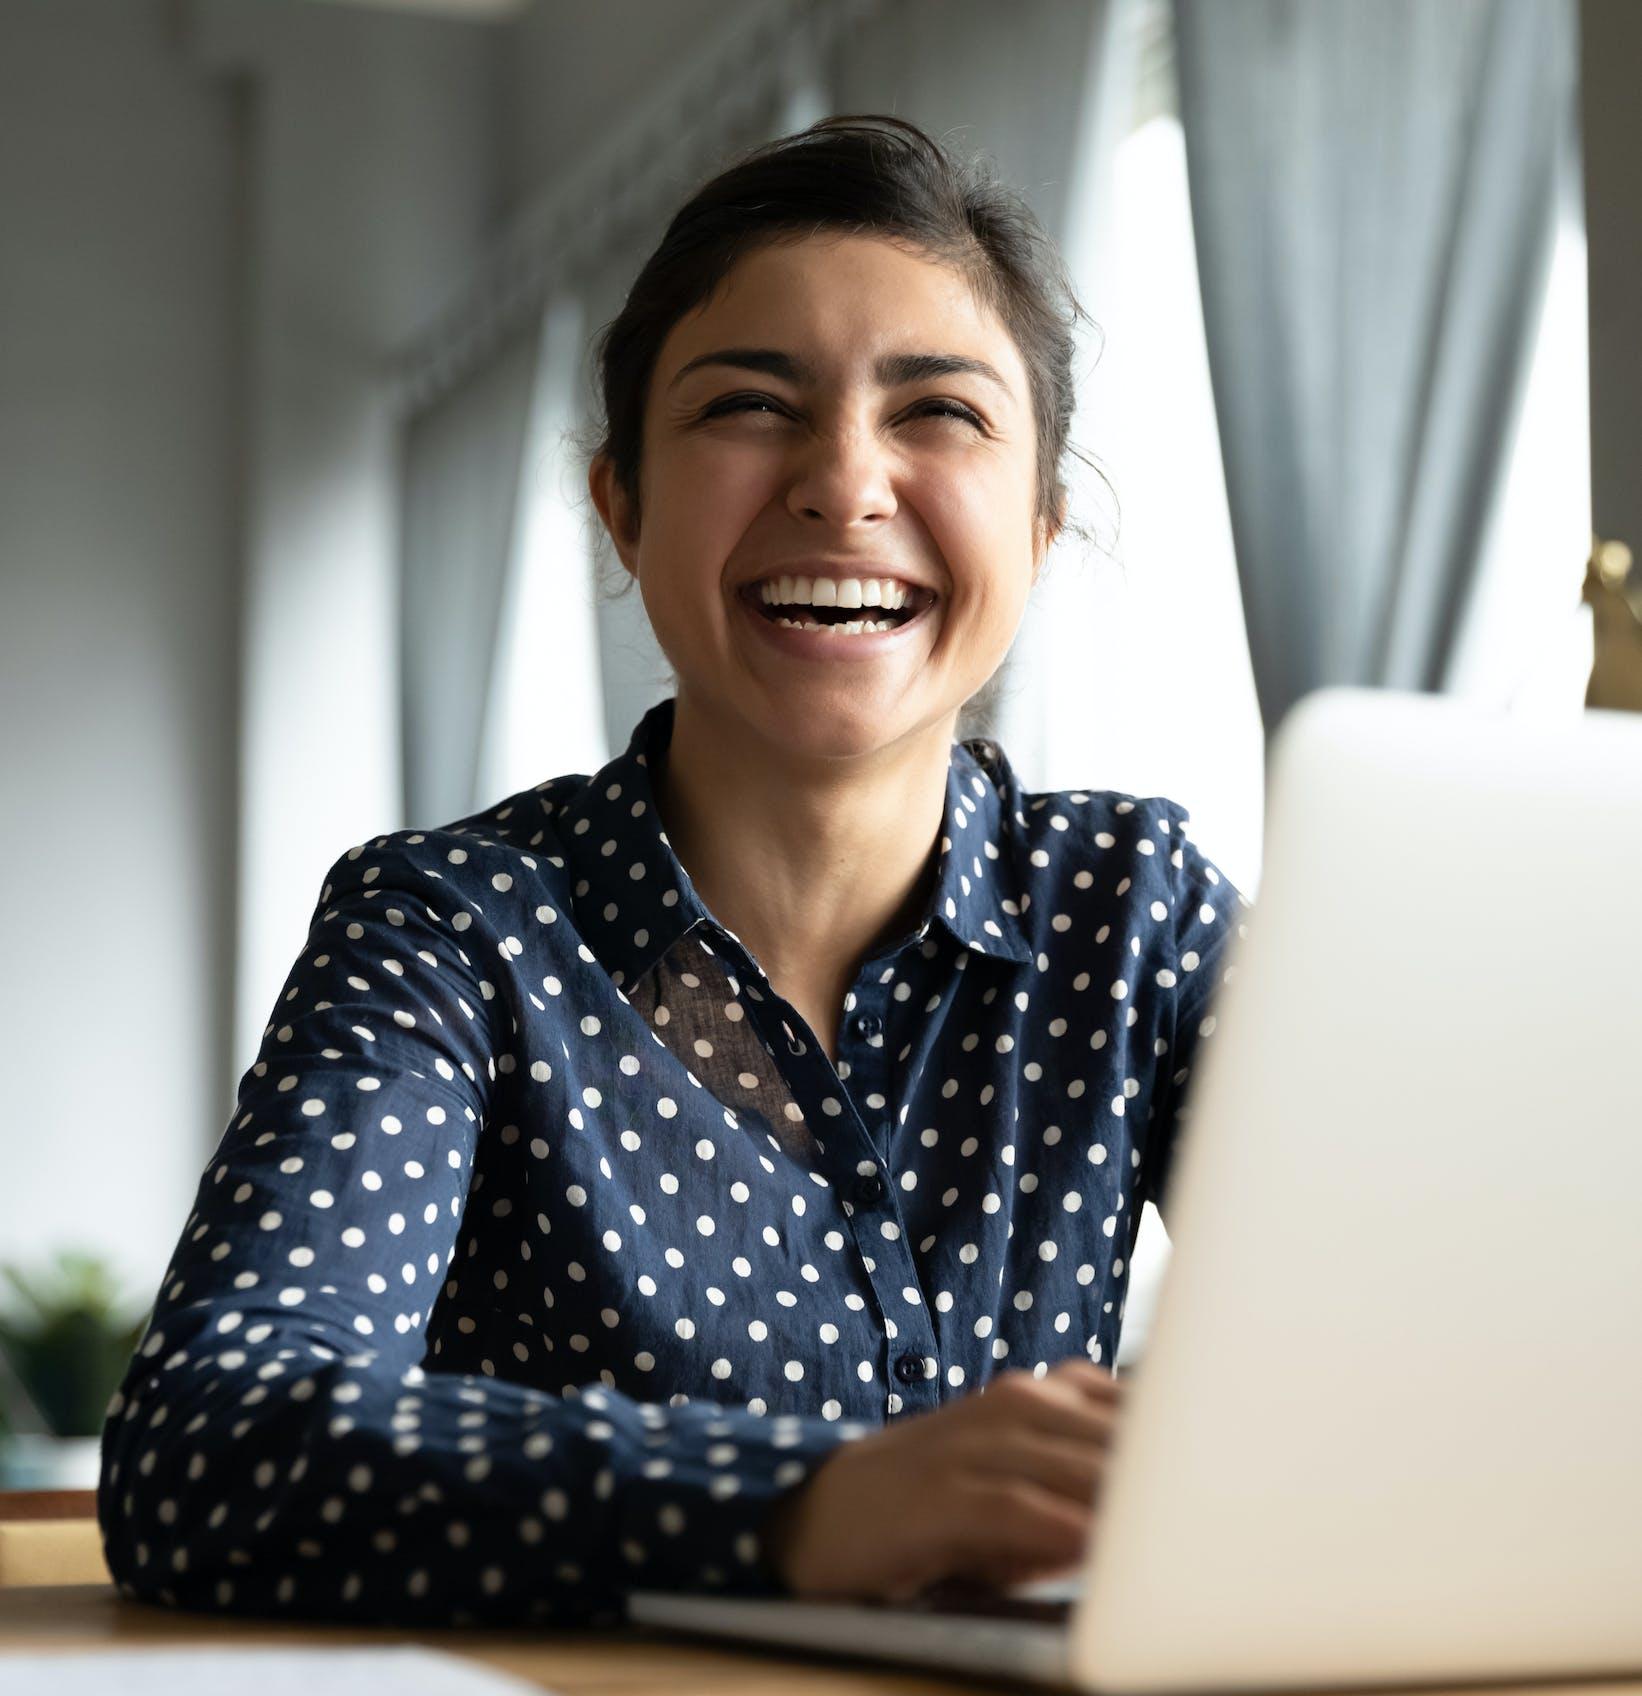 Woman on laptop laughing